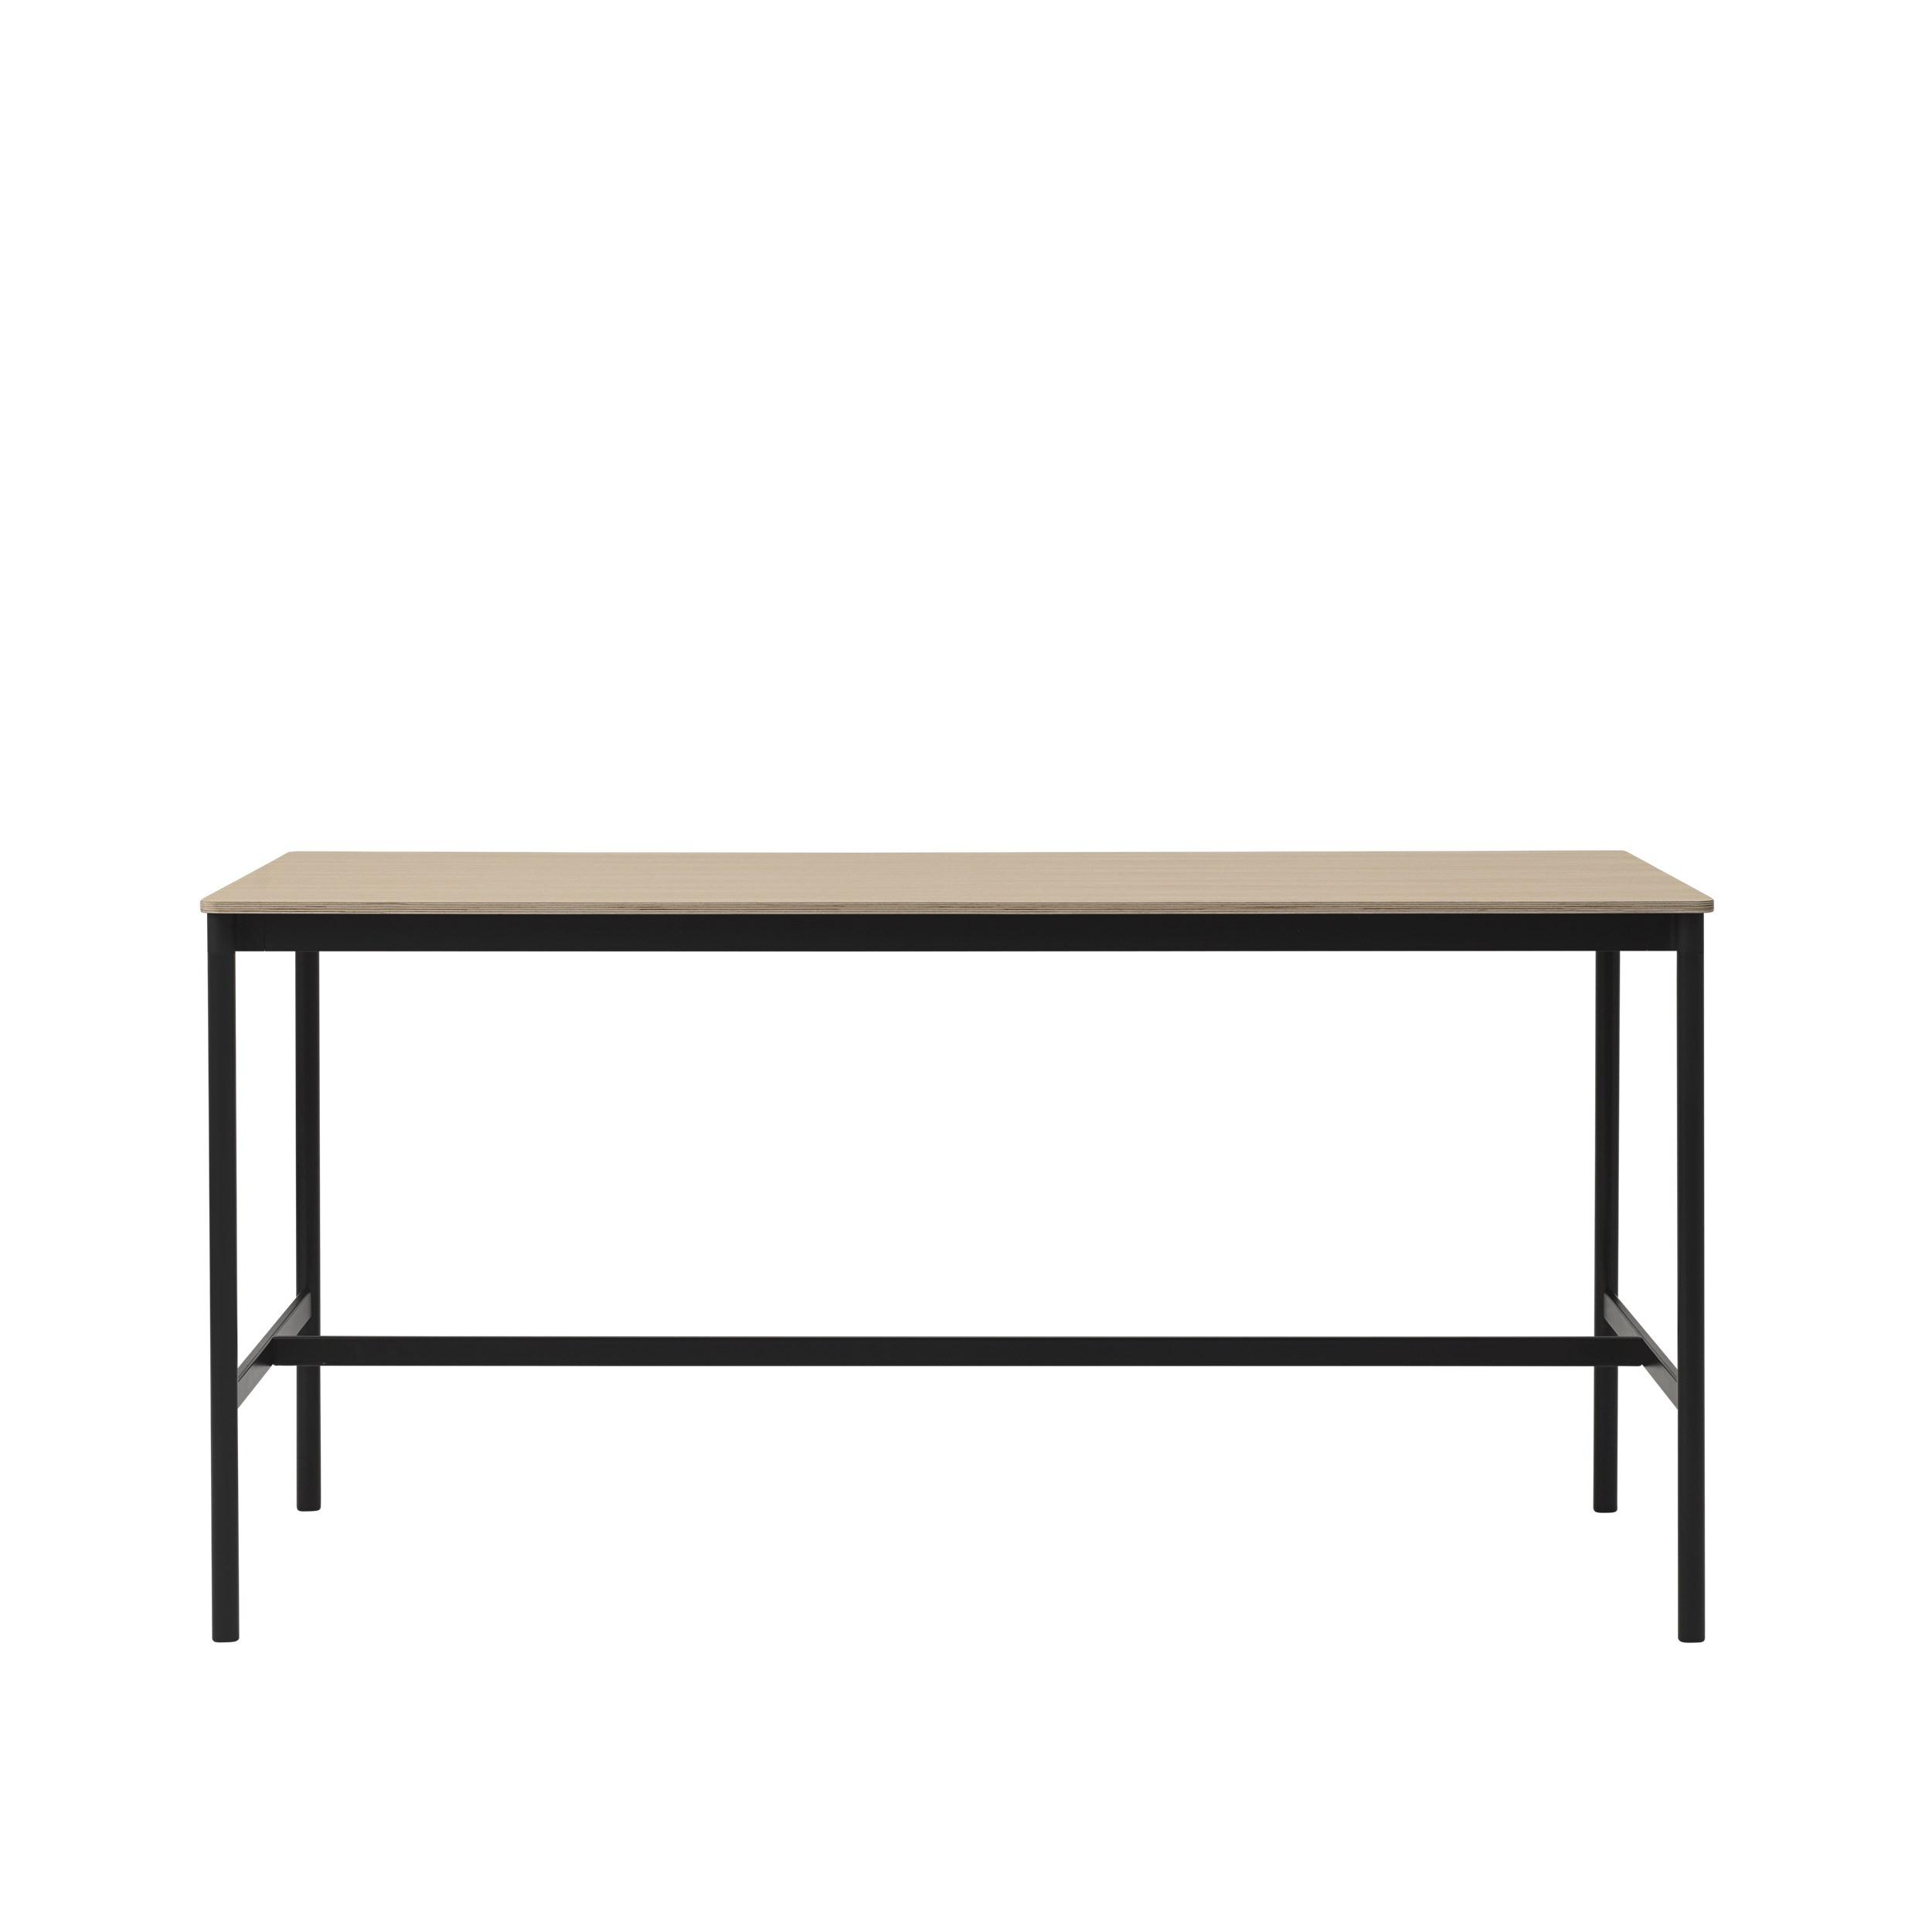 Base High Table L190 x 85, h95/105cm